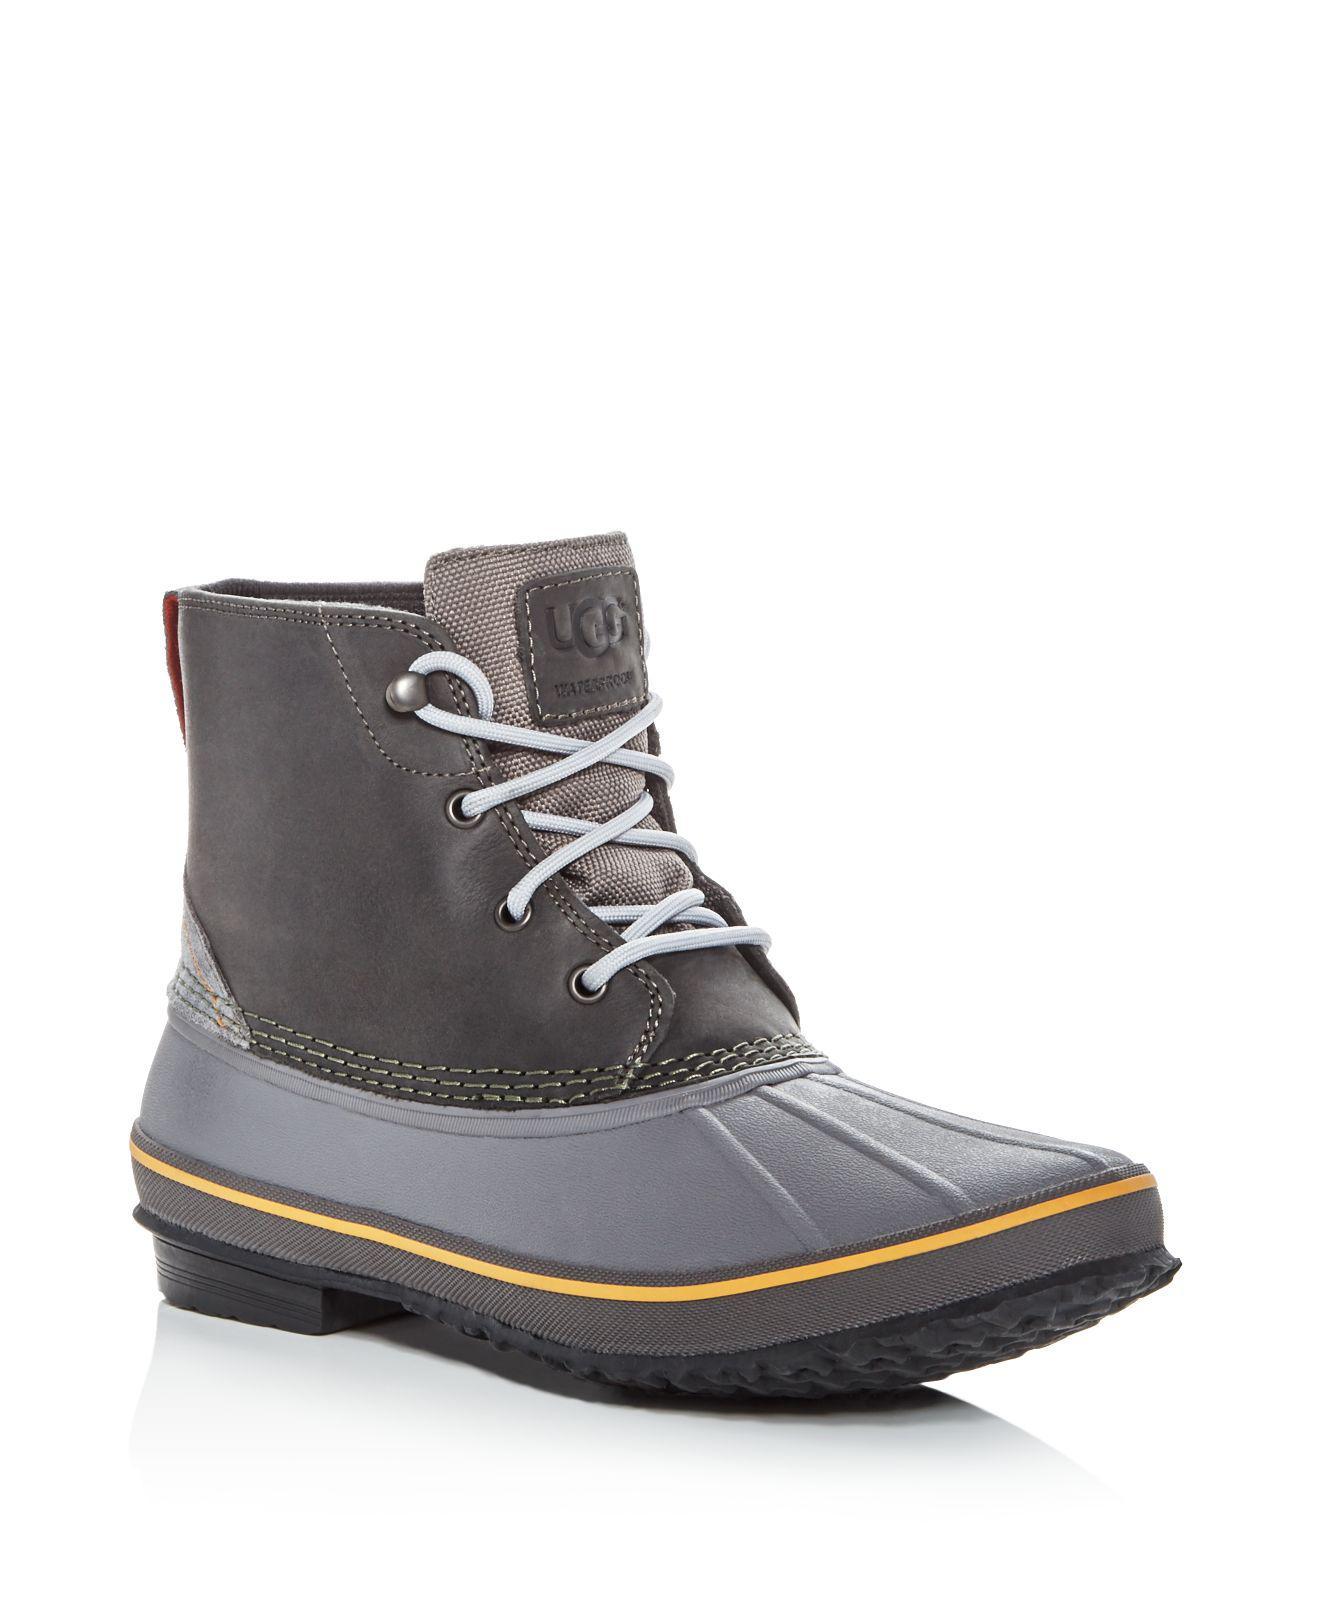 5ad2a8207ef Ugg Man Boots - Usefulresults